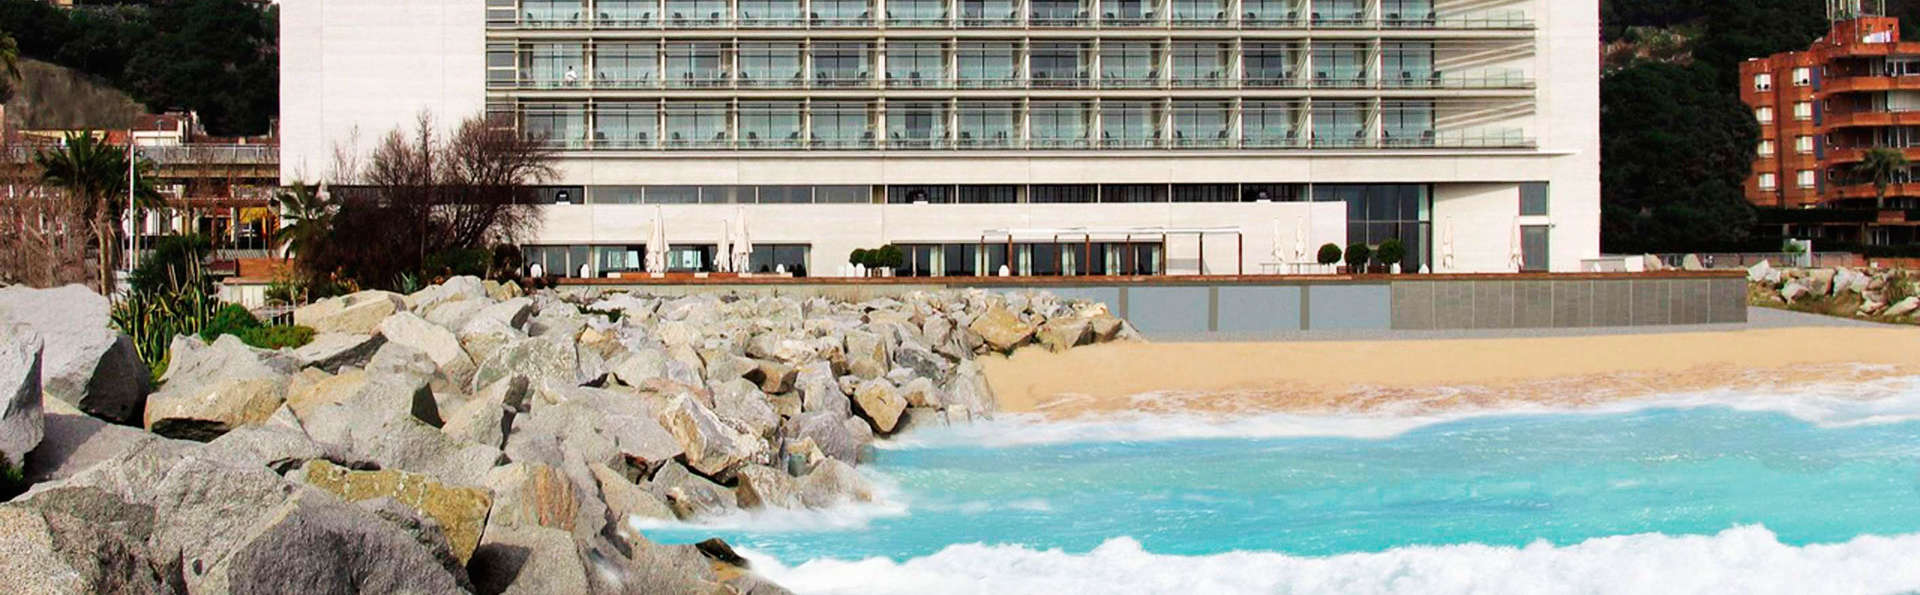 Hotel Colón Thalasso Termal - edit_front3.jpg